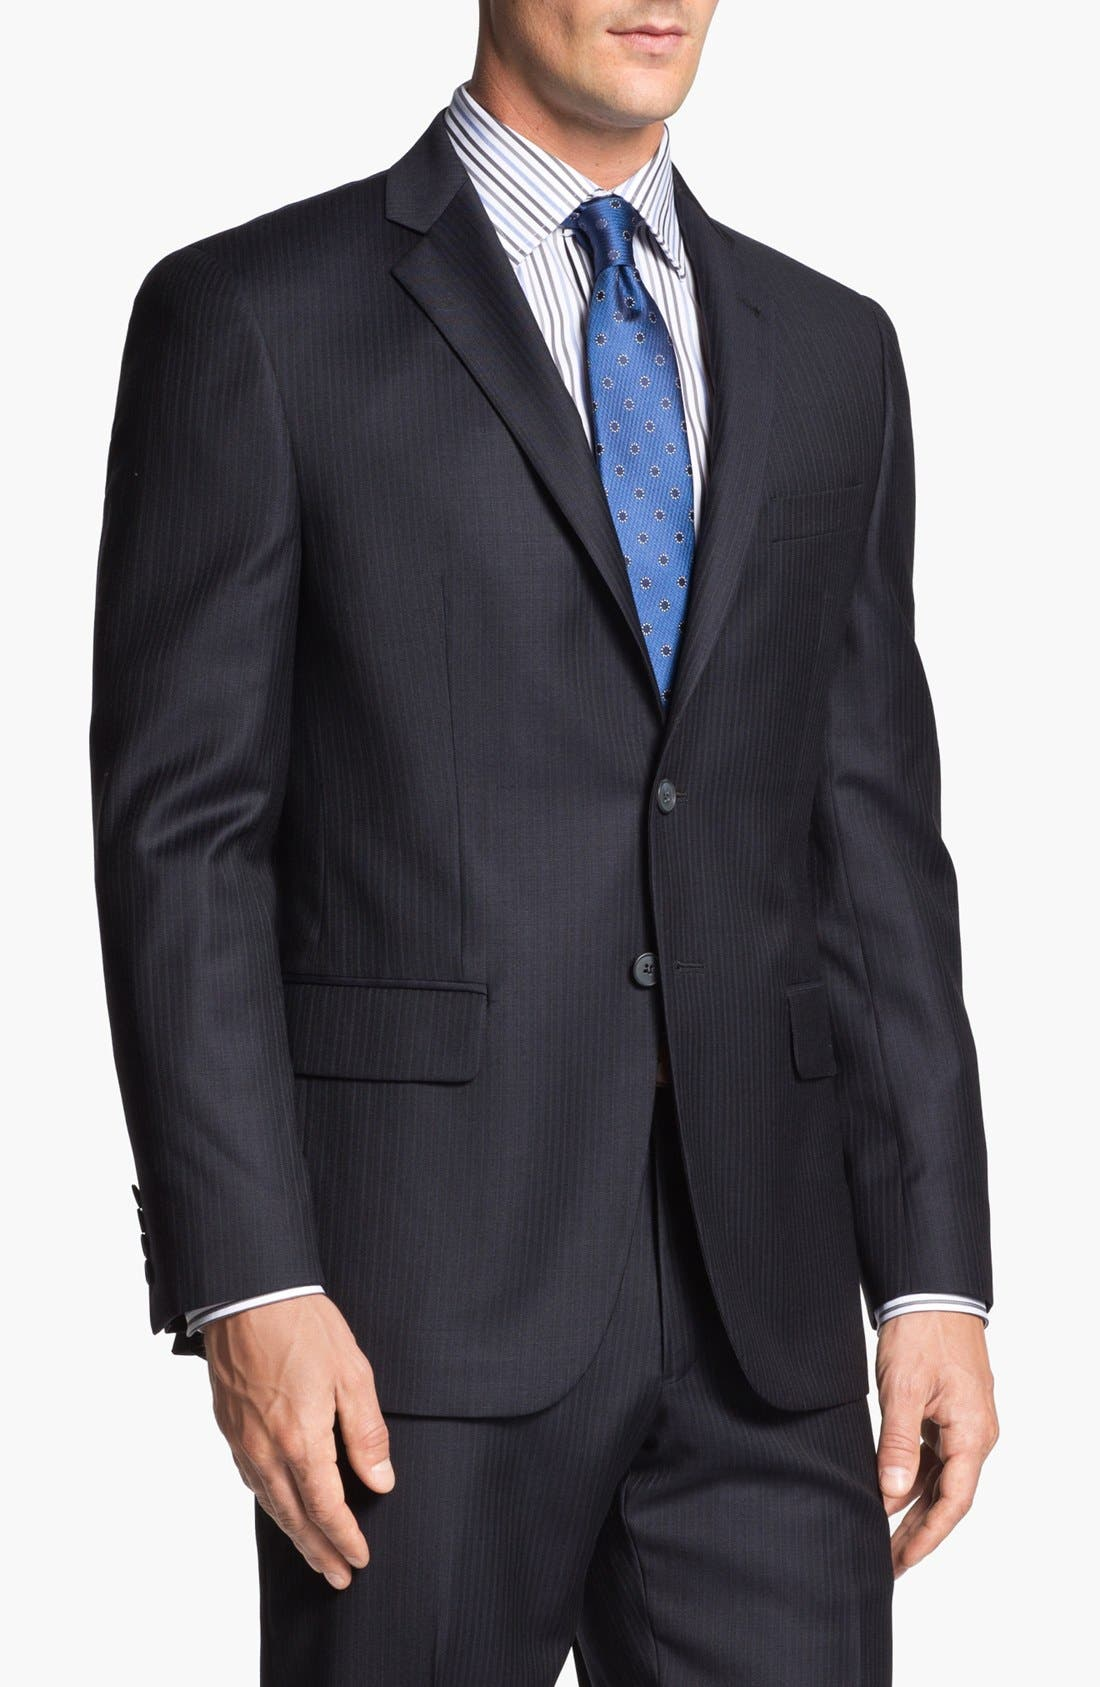 Alternate Image 2  - Joseph Abboud Suit & David Donahue Dress Shirt